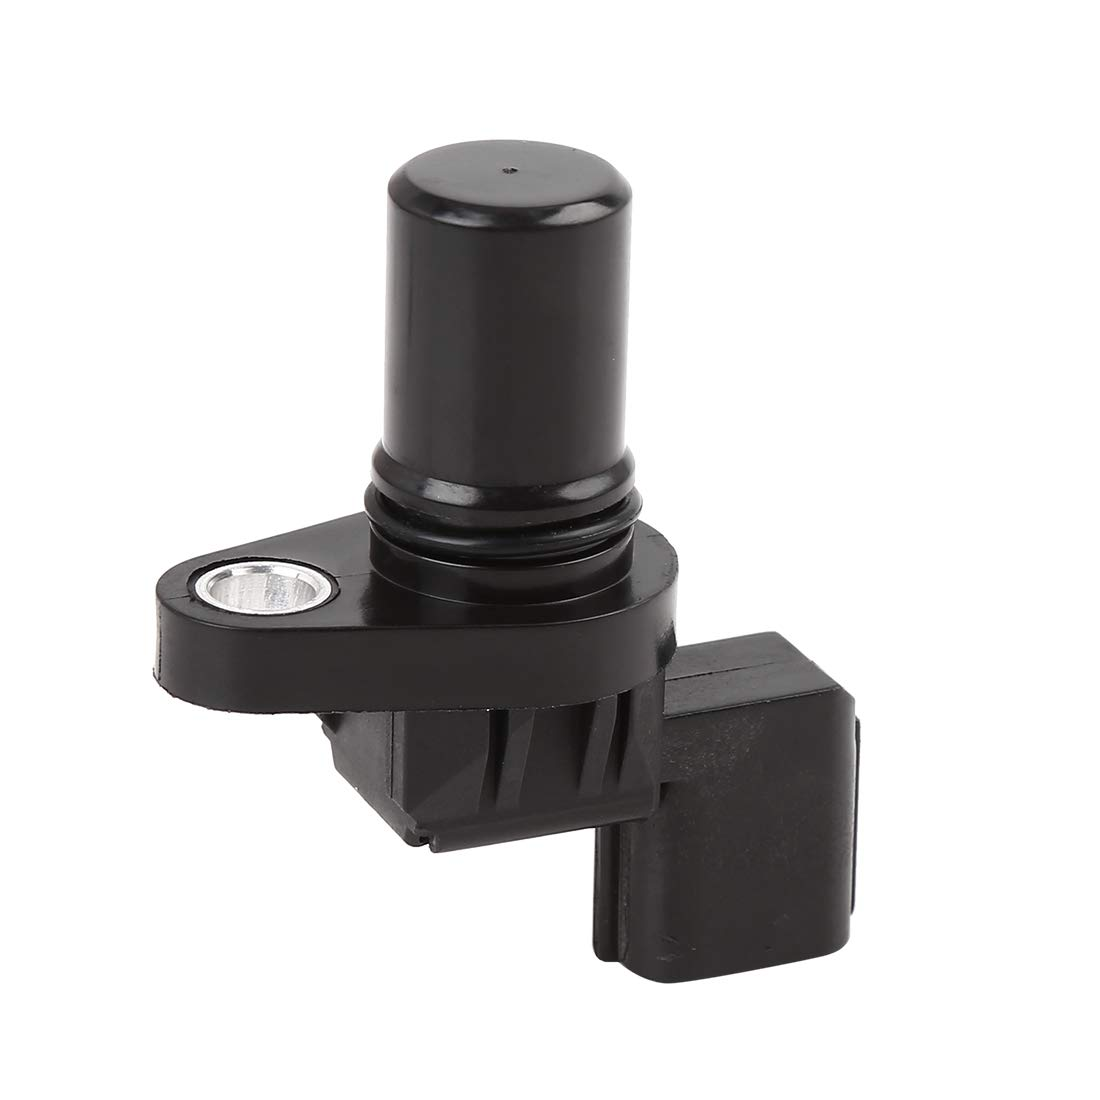 X AUTOHAUX ZJ1018221 Vehicle Engine Camshaft Position Sensor Replacement for 1999-2005 Mazda Miata